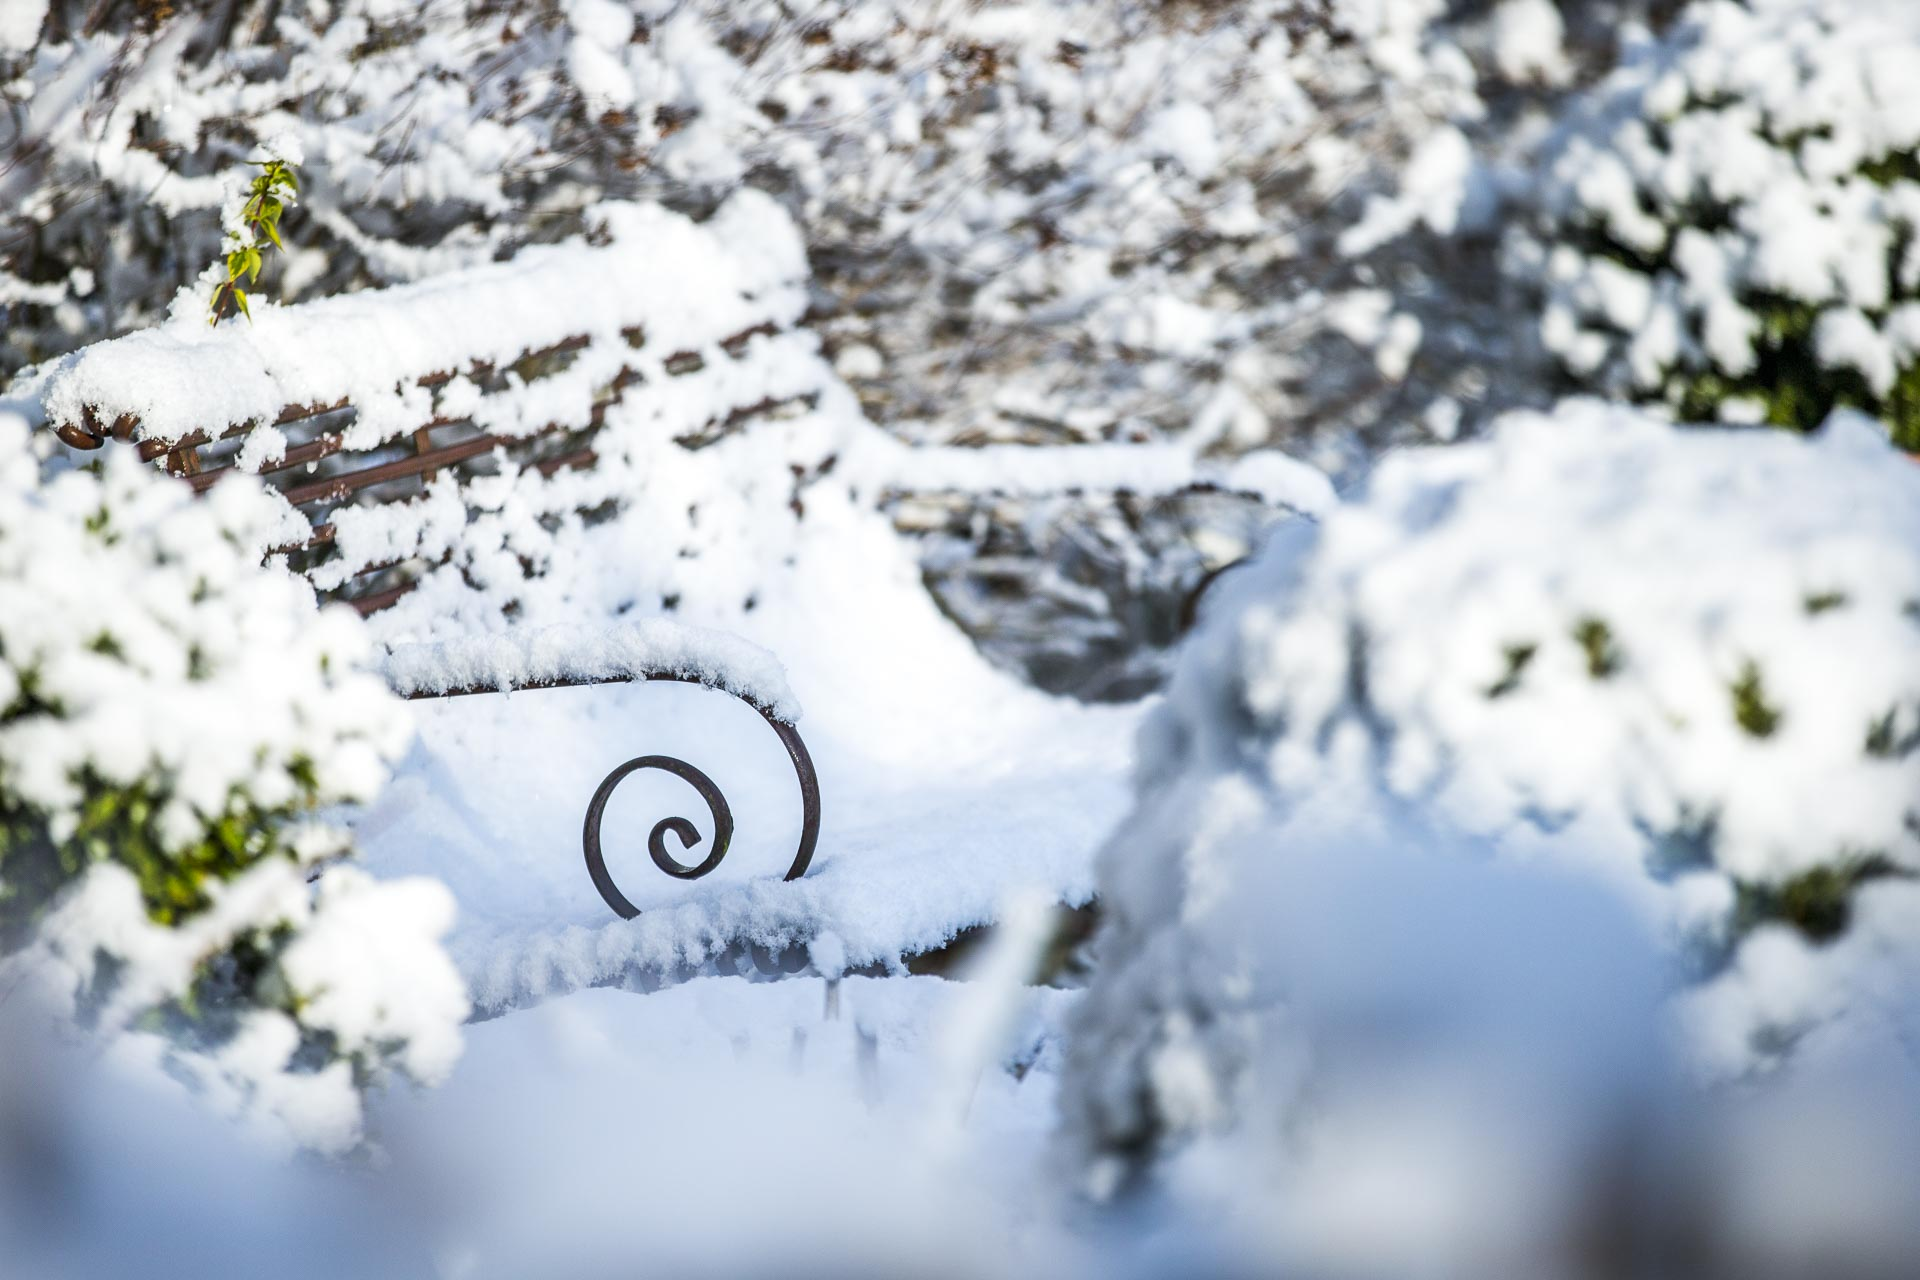 domaine_dablon_exterieurs_hiver©stephaneleroy-5309.jpg